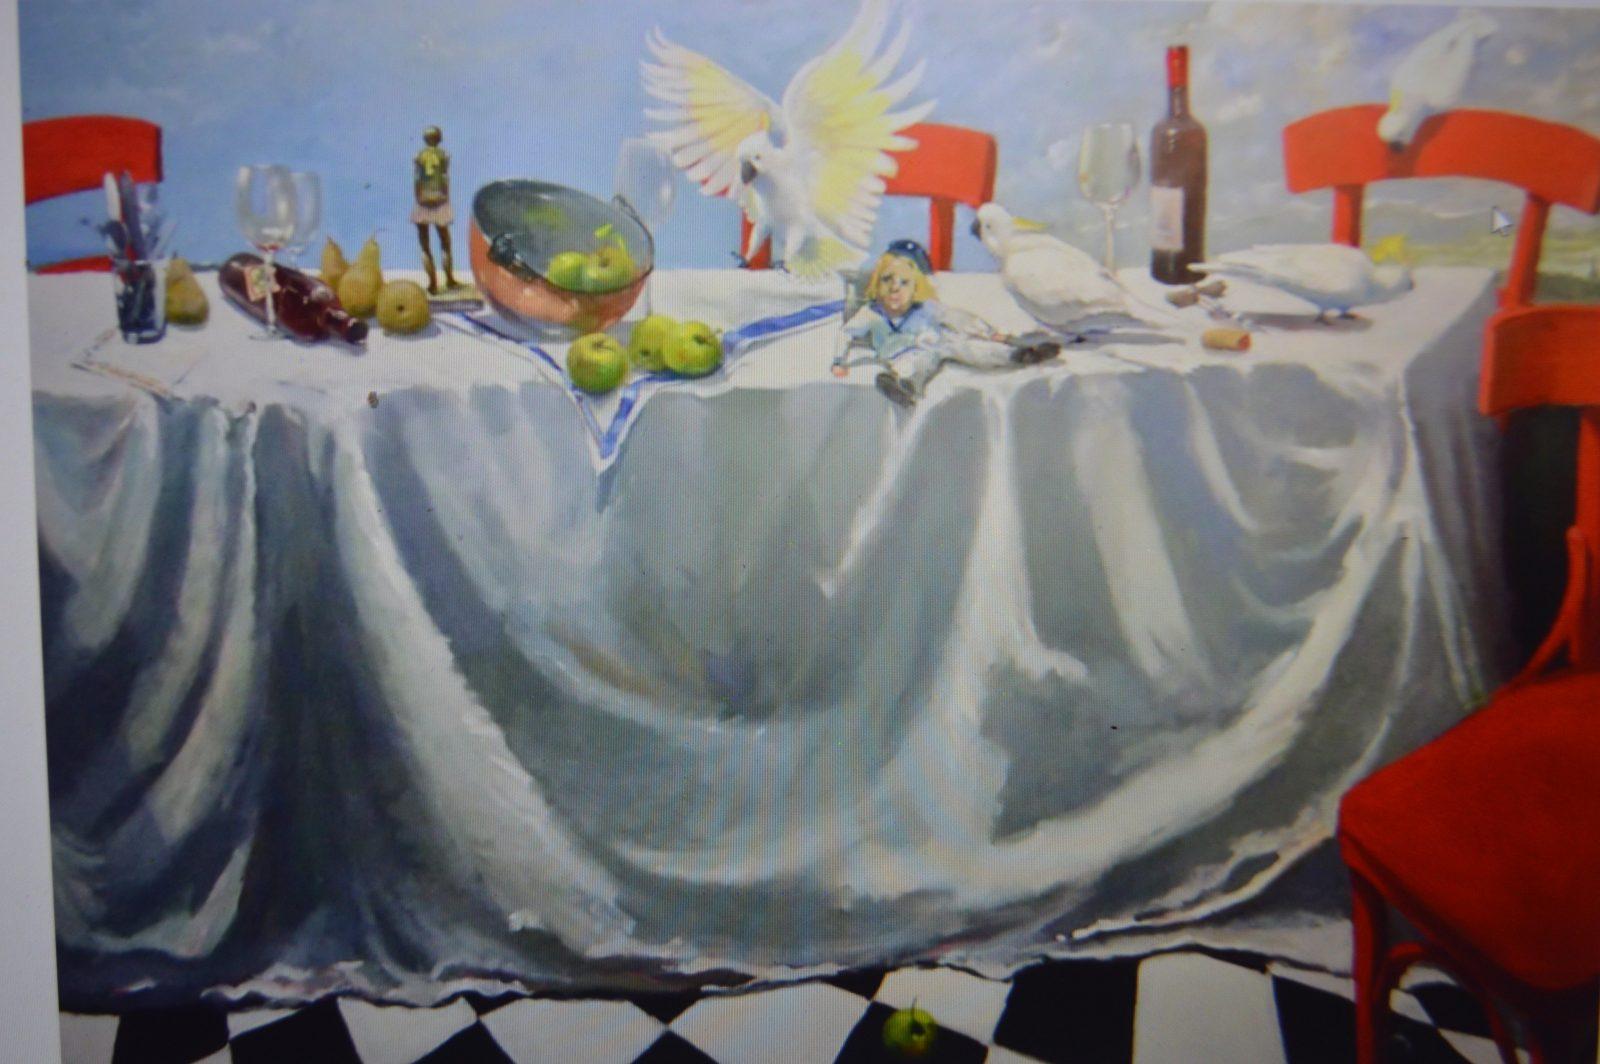 The Infinite Birdcage - John Mutsaers